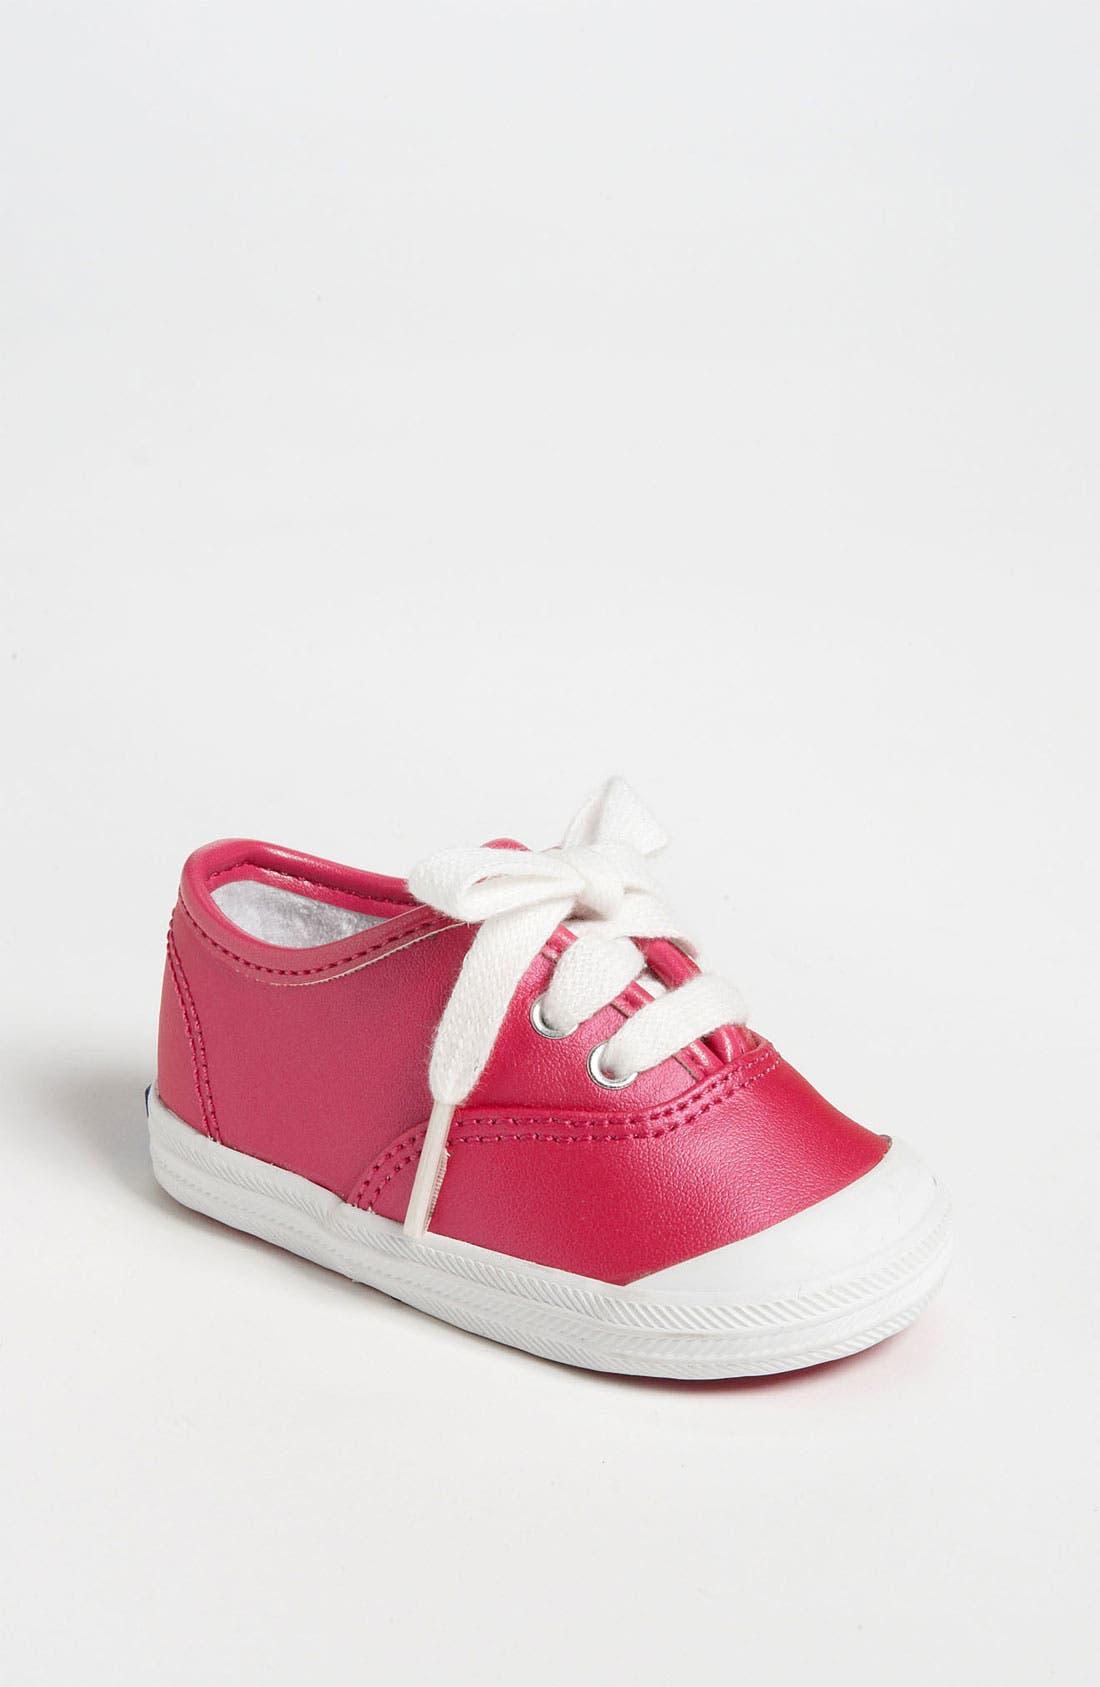 Alternate Image 1 Selected - Keds® 'Champion' Crib Shoe (Baby)